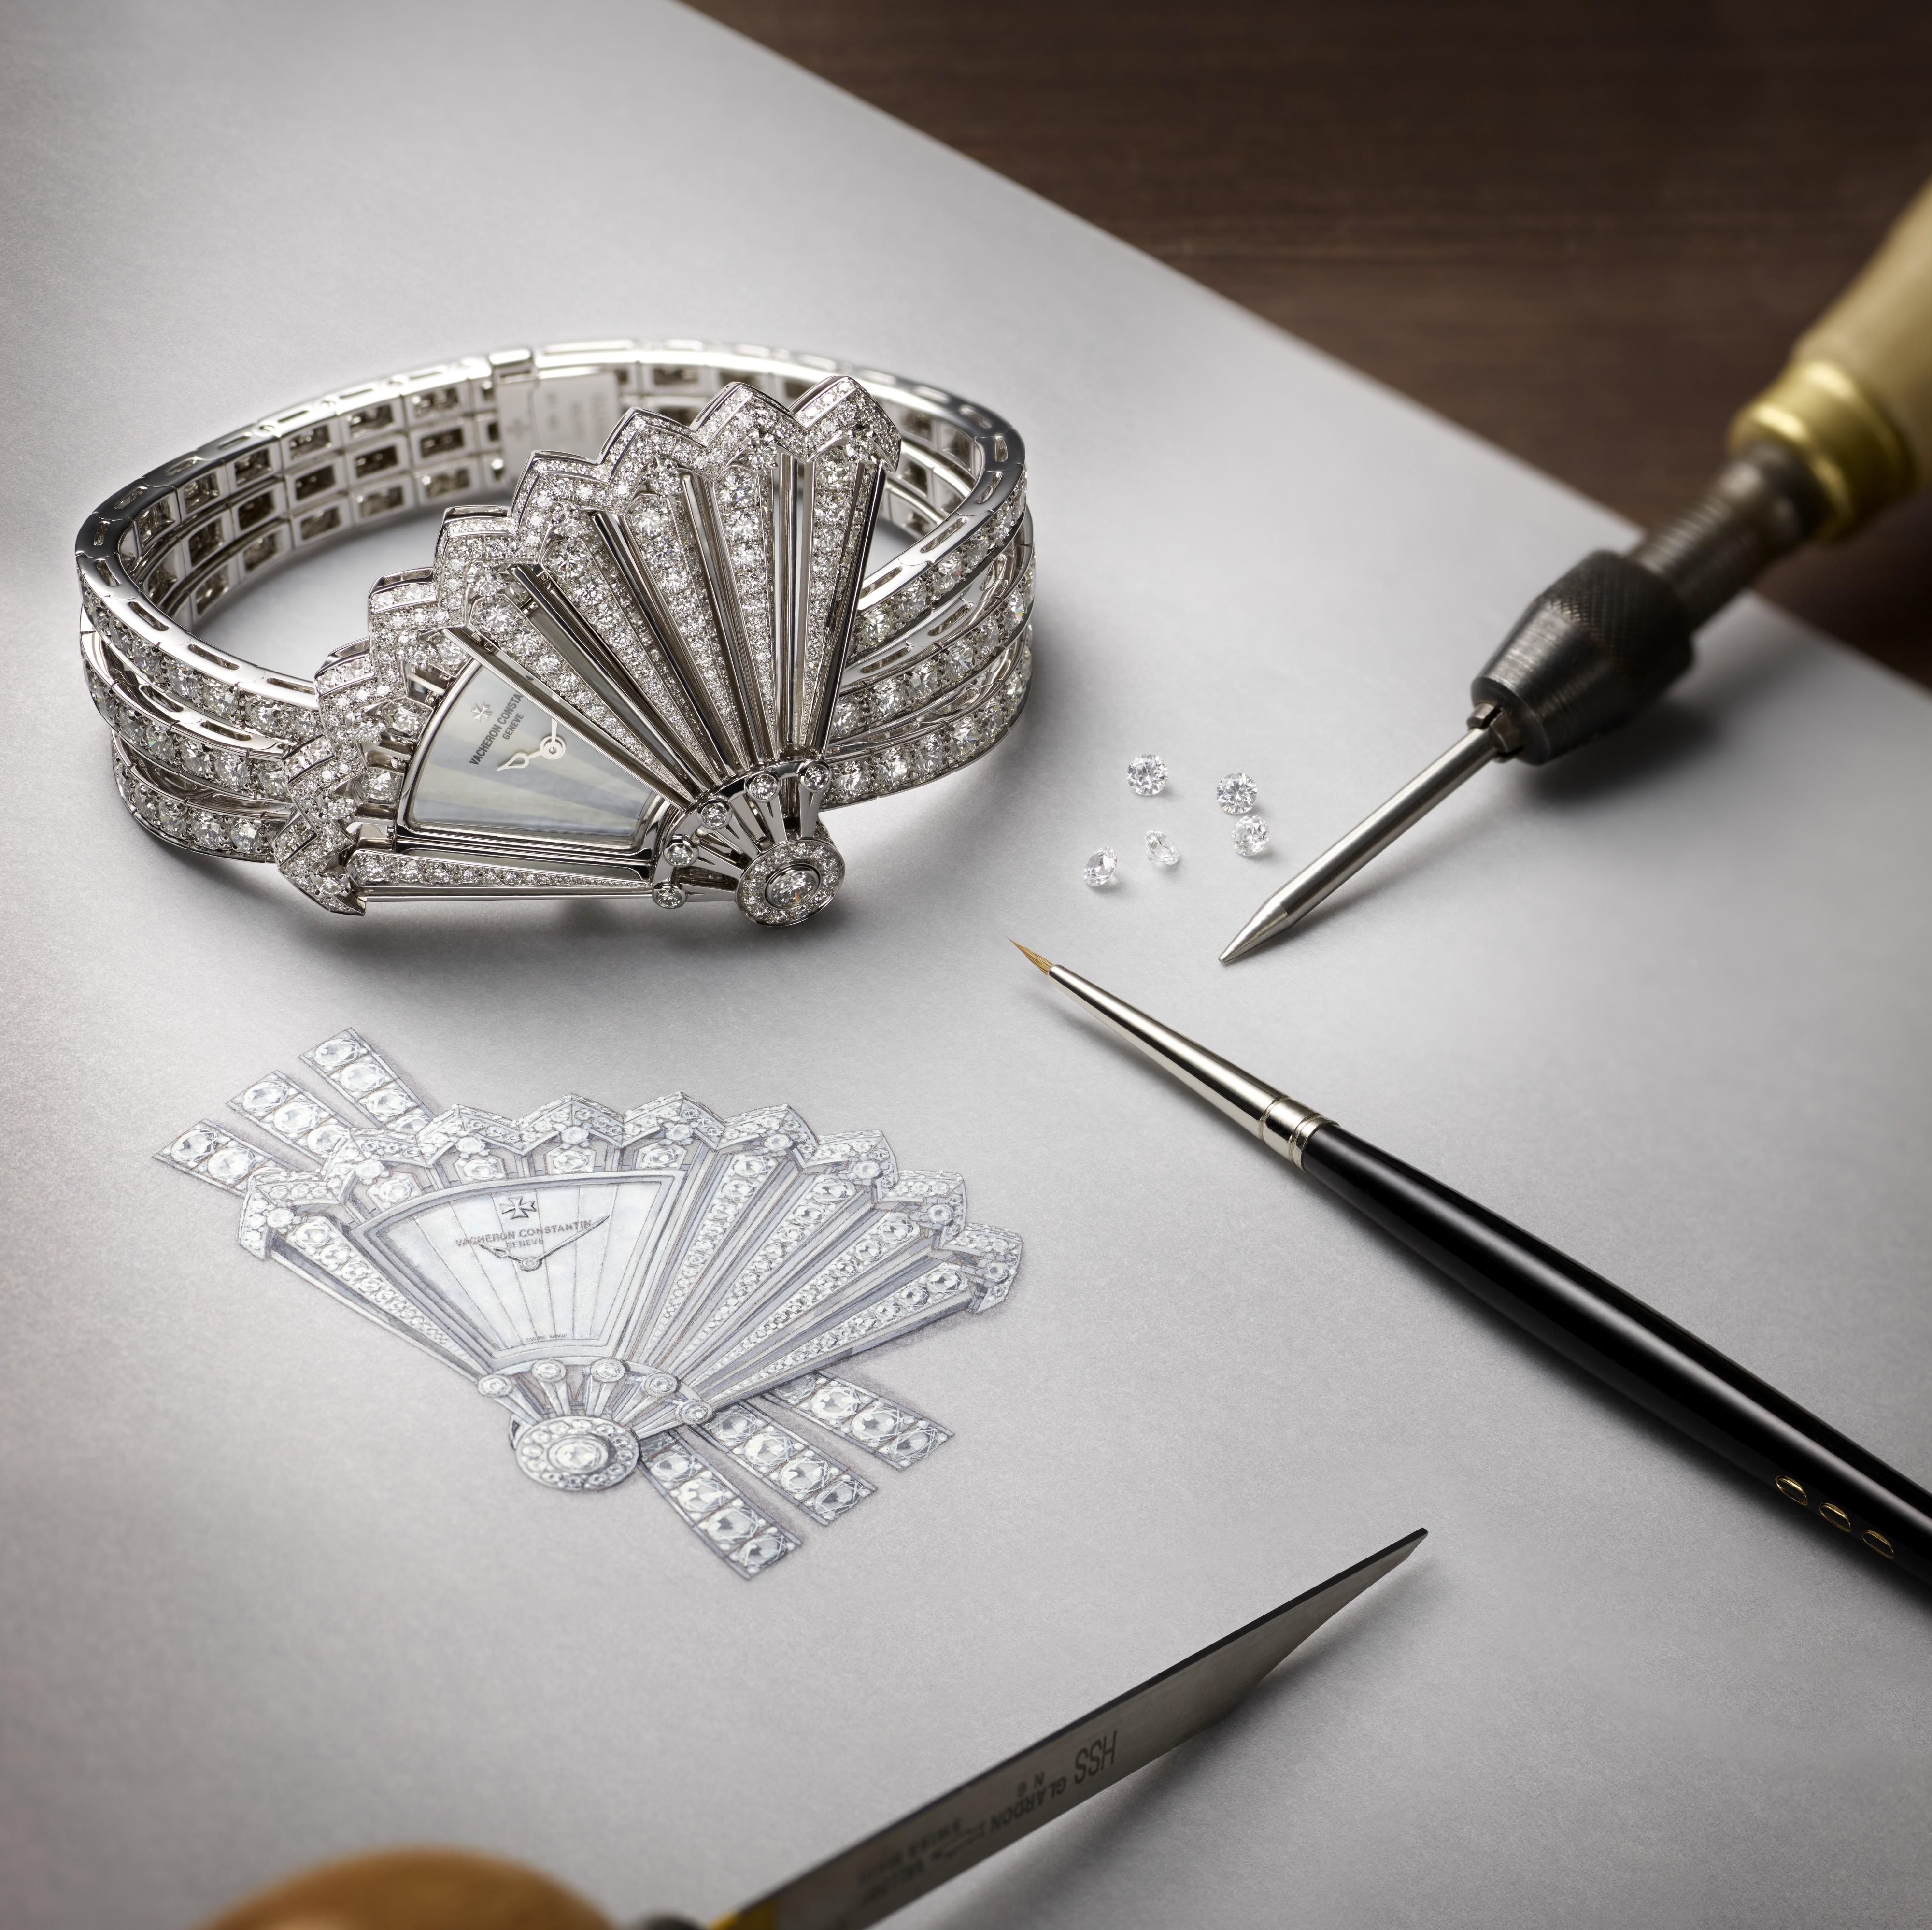 78c931ad5ef Vacheron Constantin lança a linha Heures Créatives - Vogue